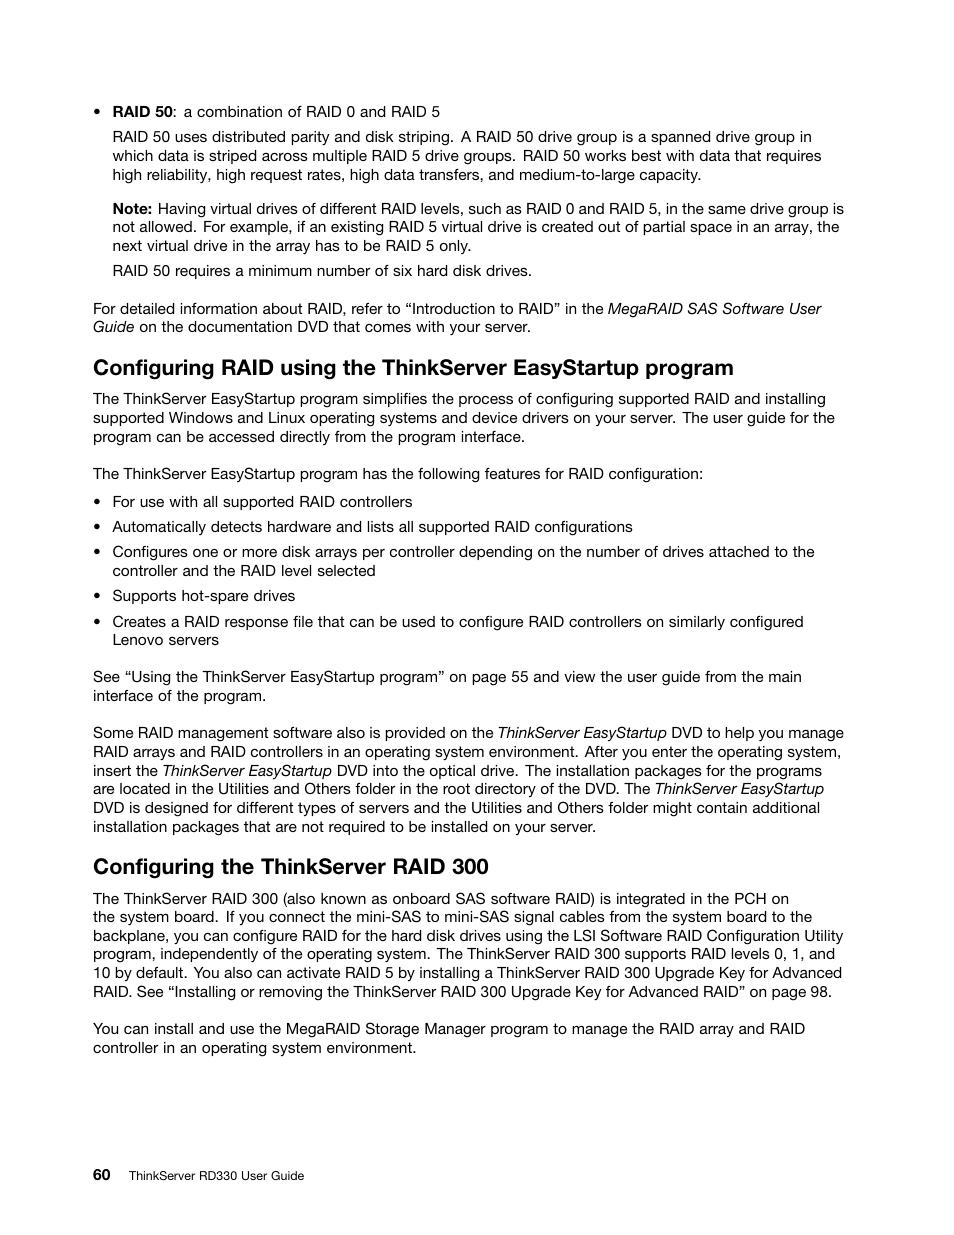 Configuring the thinkserver raid 300   Lenovo ThinkServer